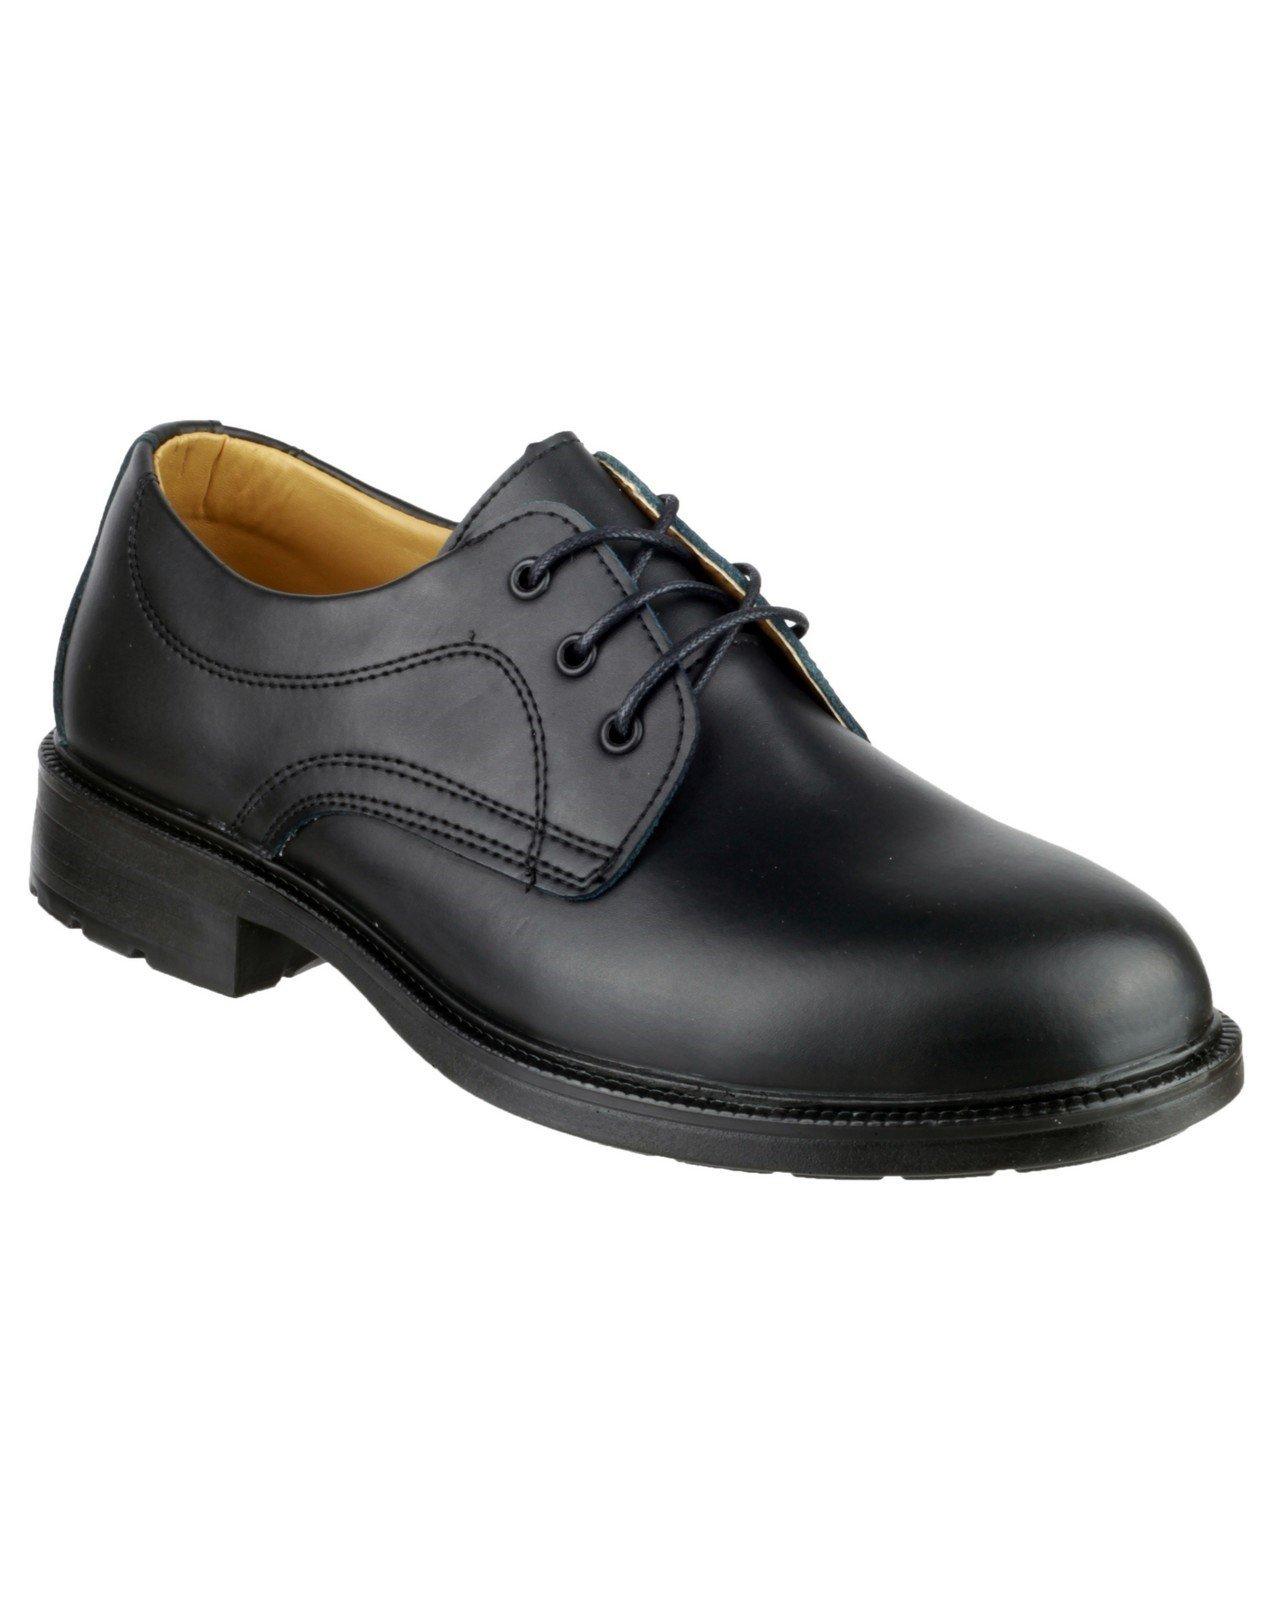 Amblers Men's Newport Derby Shoe Black 20208 - Black 6